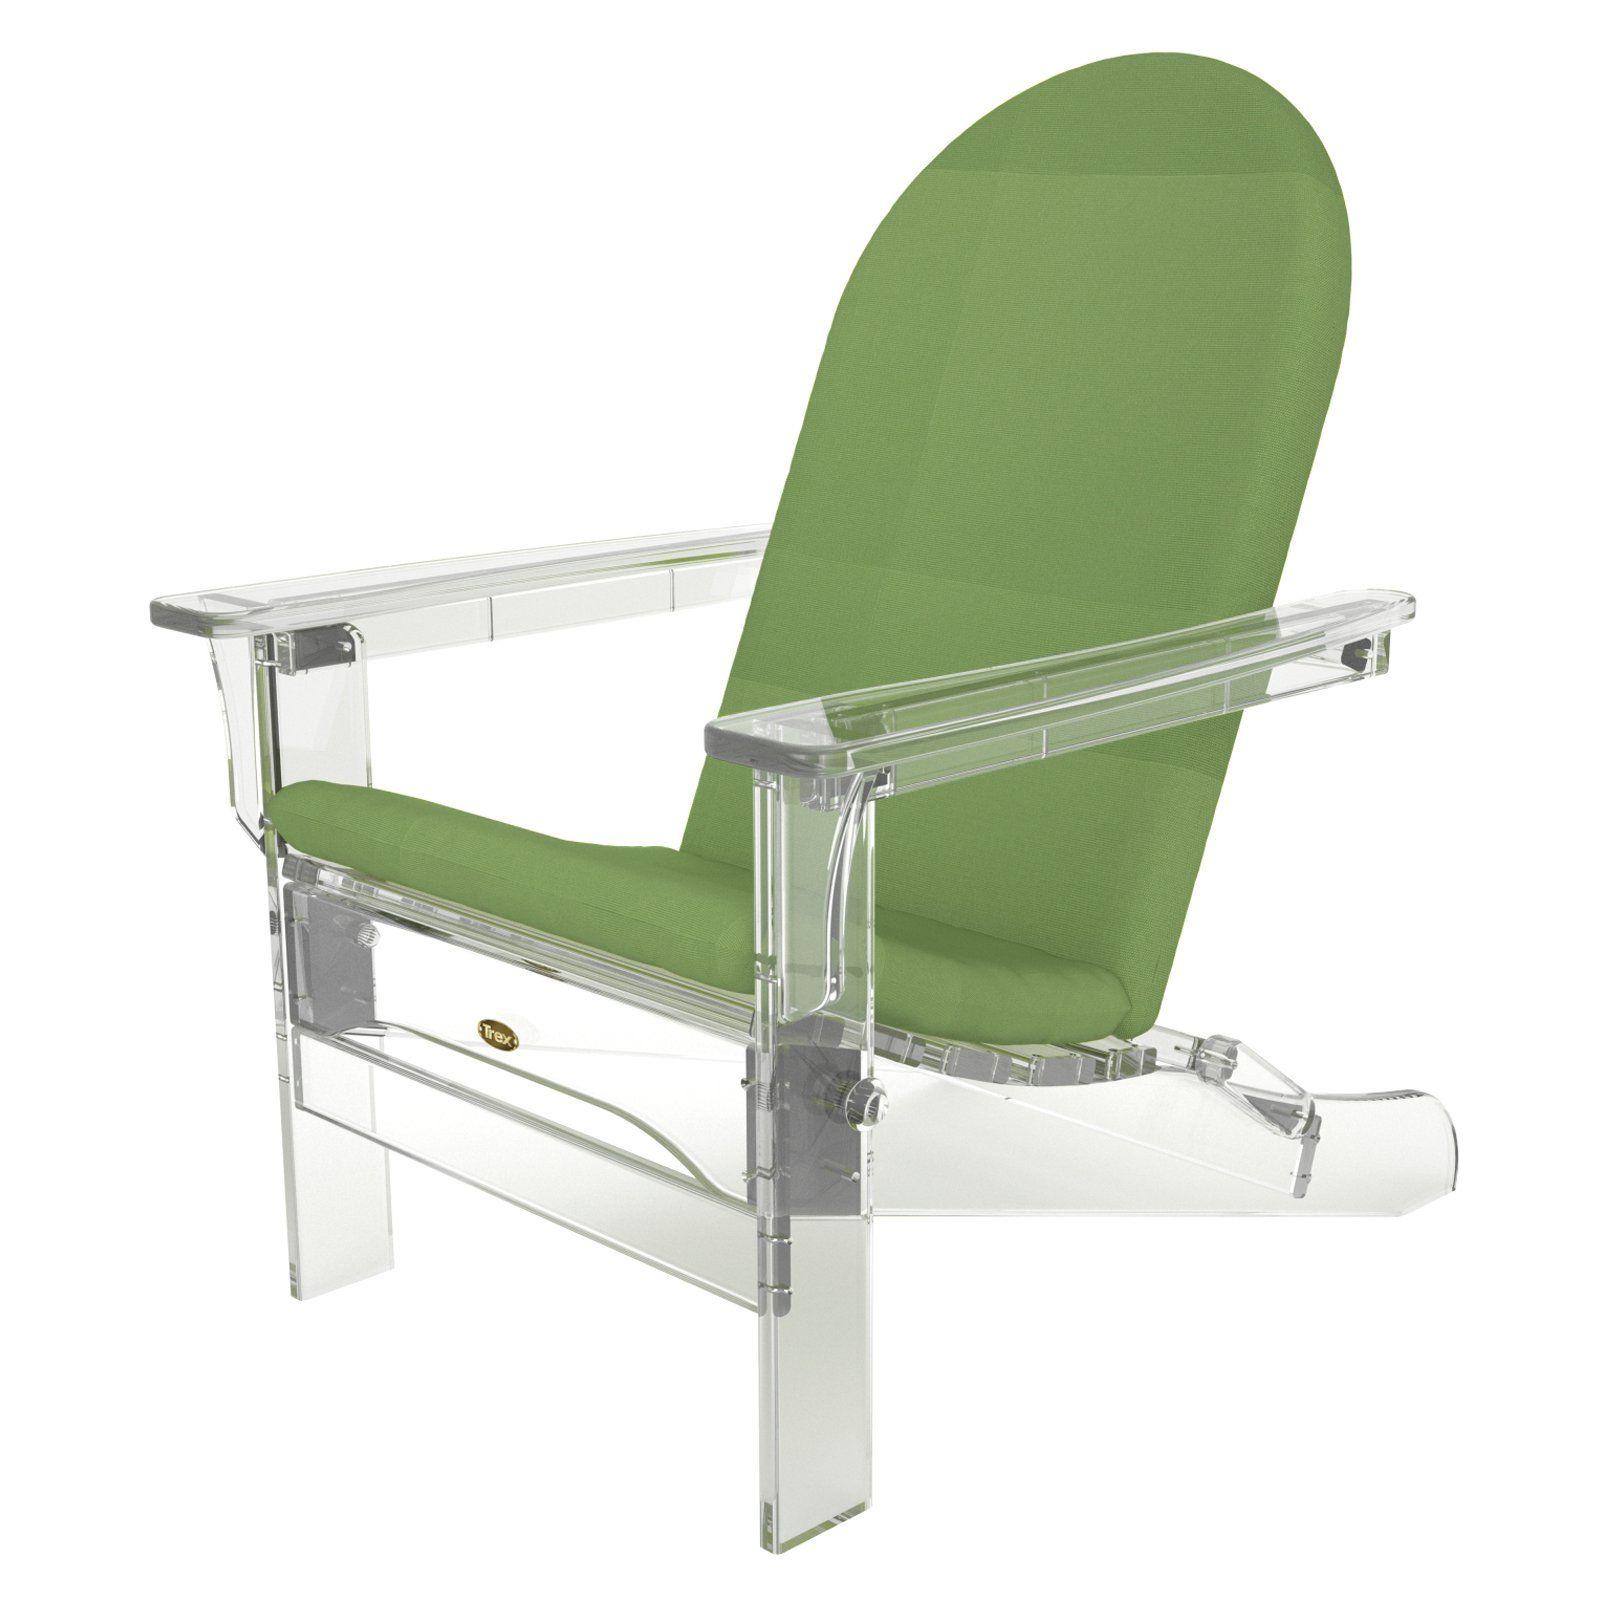 Trex Outdoor Furniture Sunbrella 46 In. Hinged Arch Top